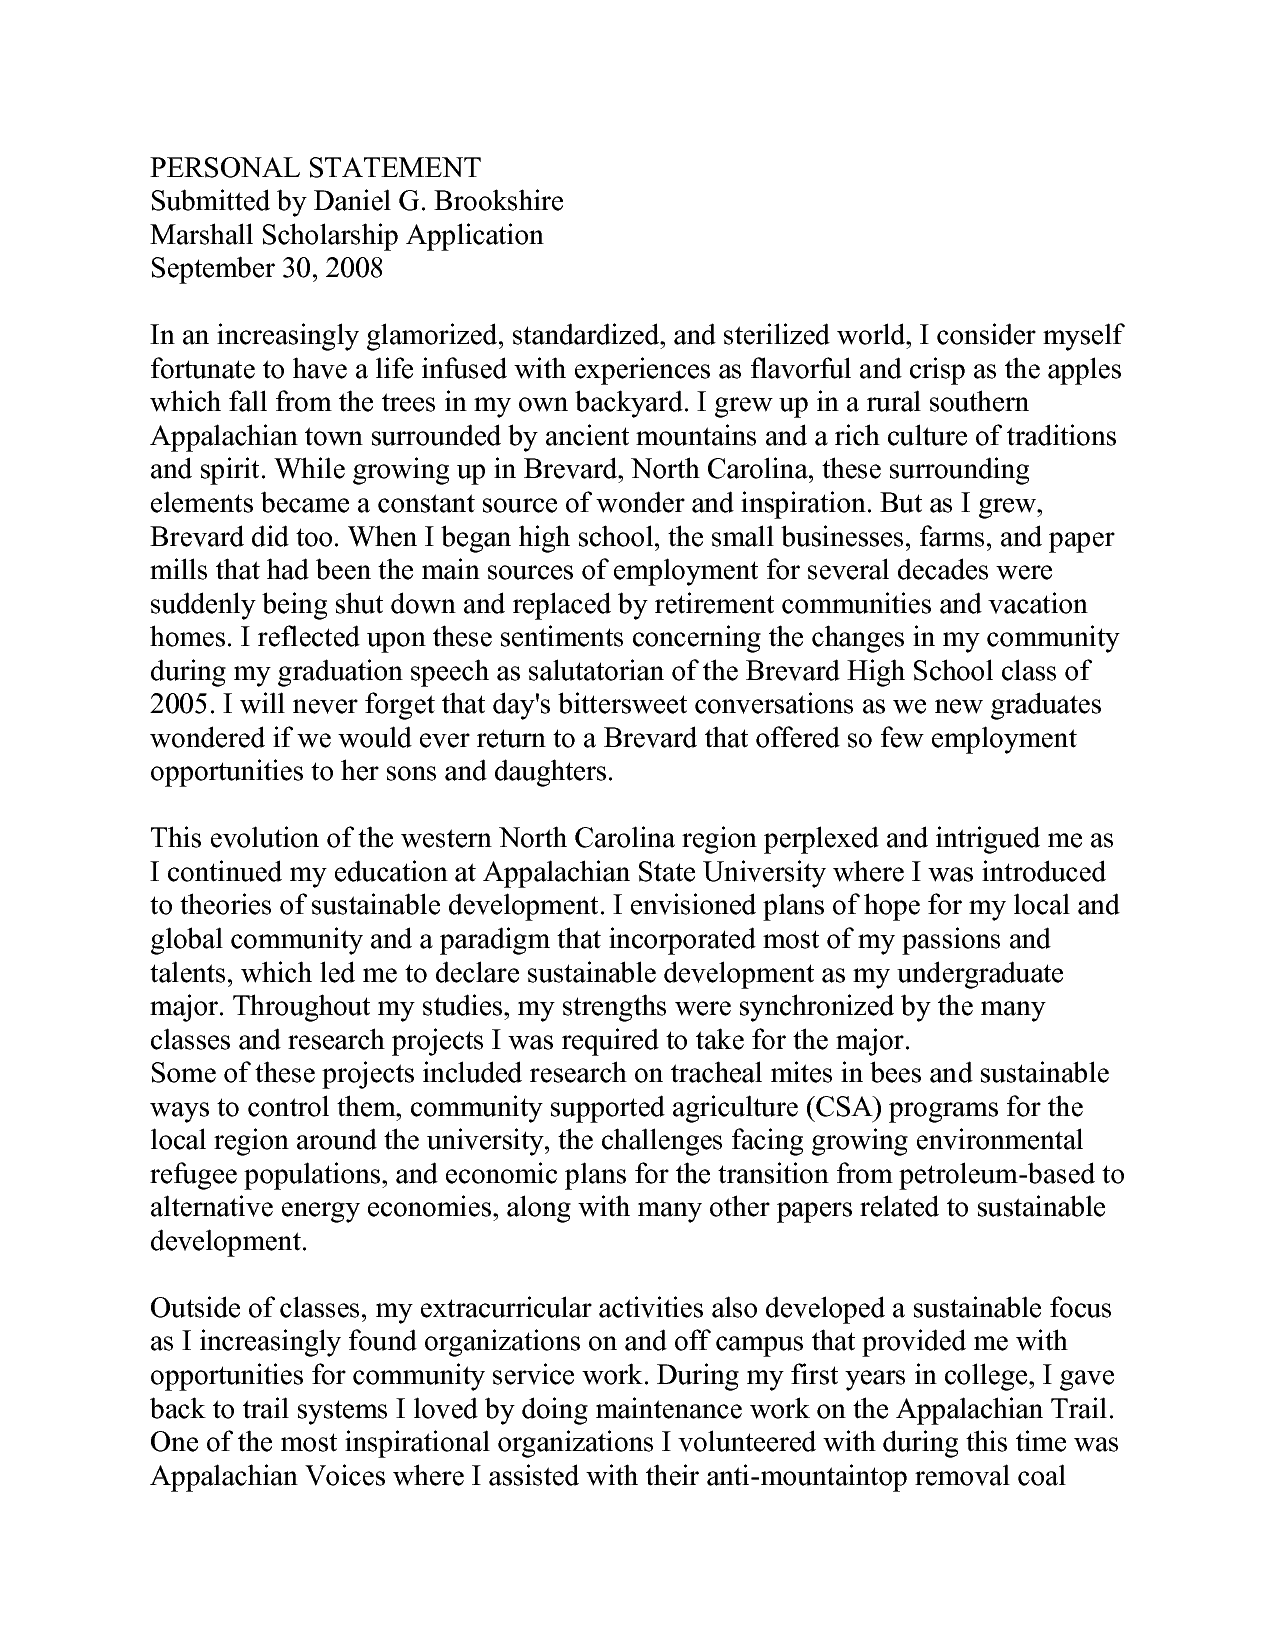 004 Scholarship Personal Statement Template Nsvwiupr Essay Example Header Phenomenal Format Mla Paper Margins Full